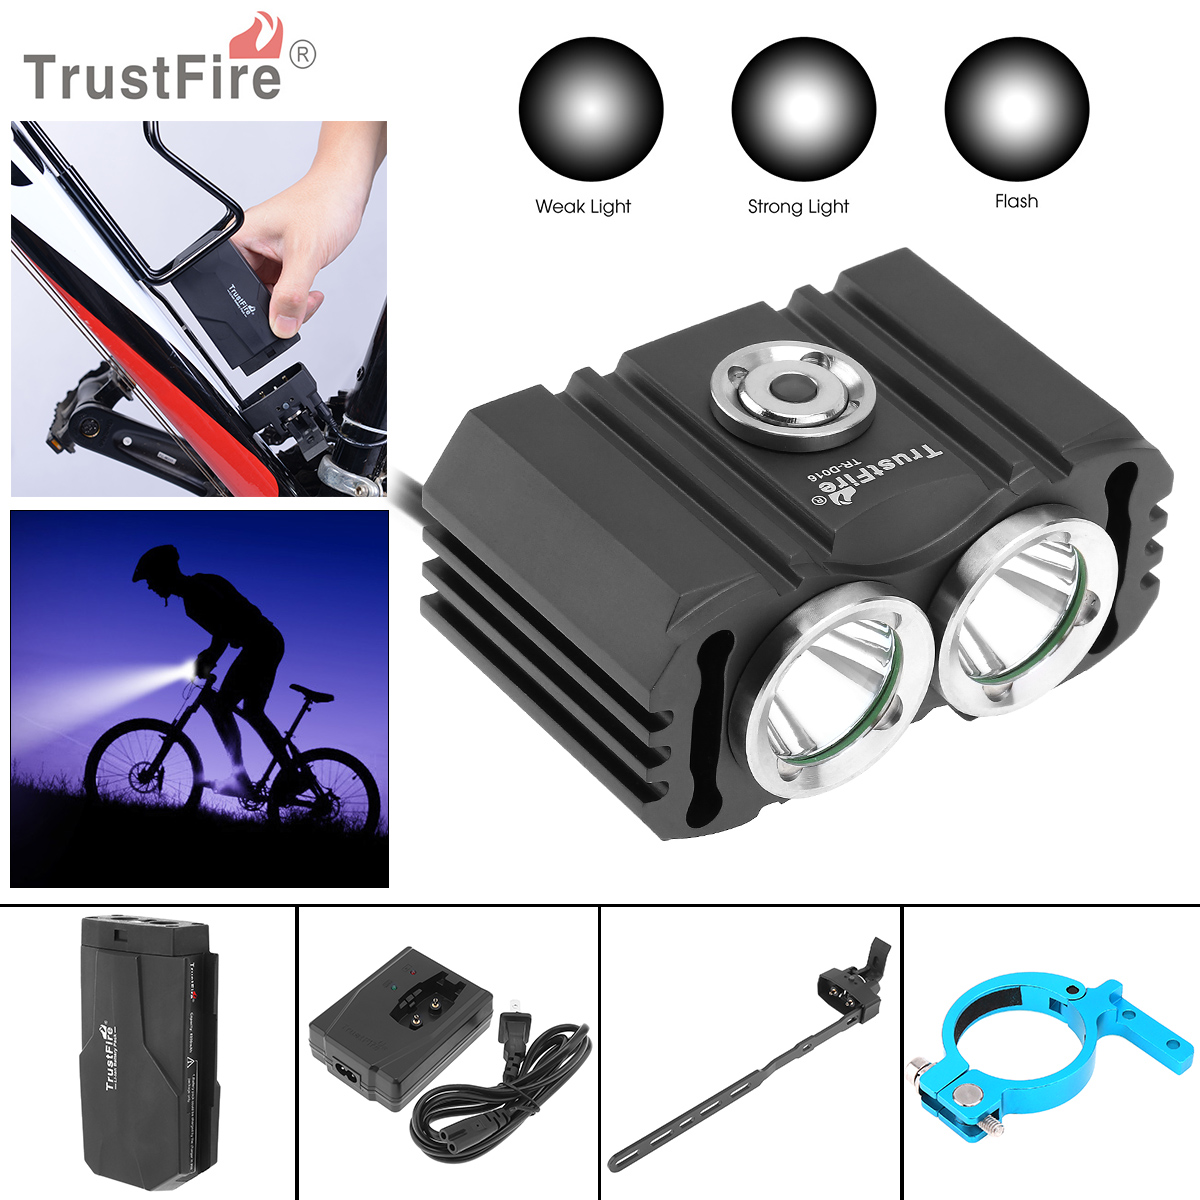 TrustFire 3 Switch Mode D016 2x XM-L2 LED 4.2V Waterproof Bicycle Head Light  + 6200mAh Battery Pack Kits for Bicycle Light trustfire 3 led 3 mode 1100lm cool white light bike light grey purple 2 8 4 2v